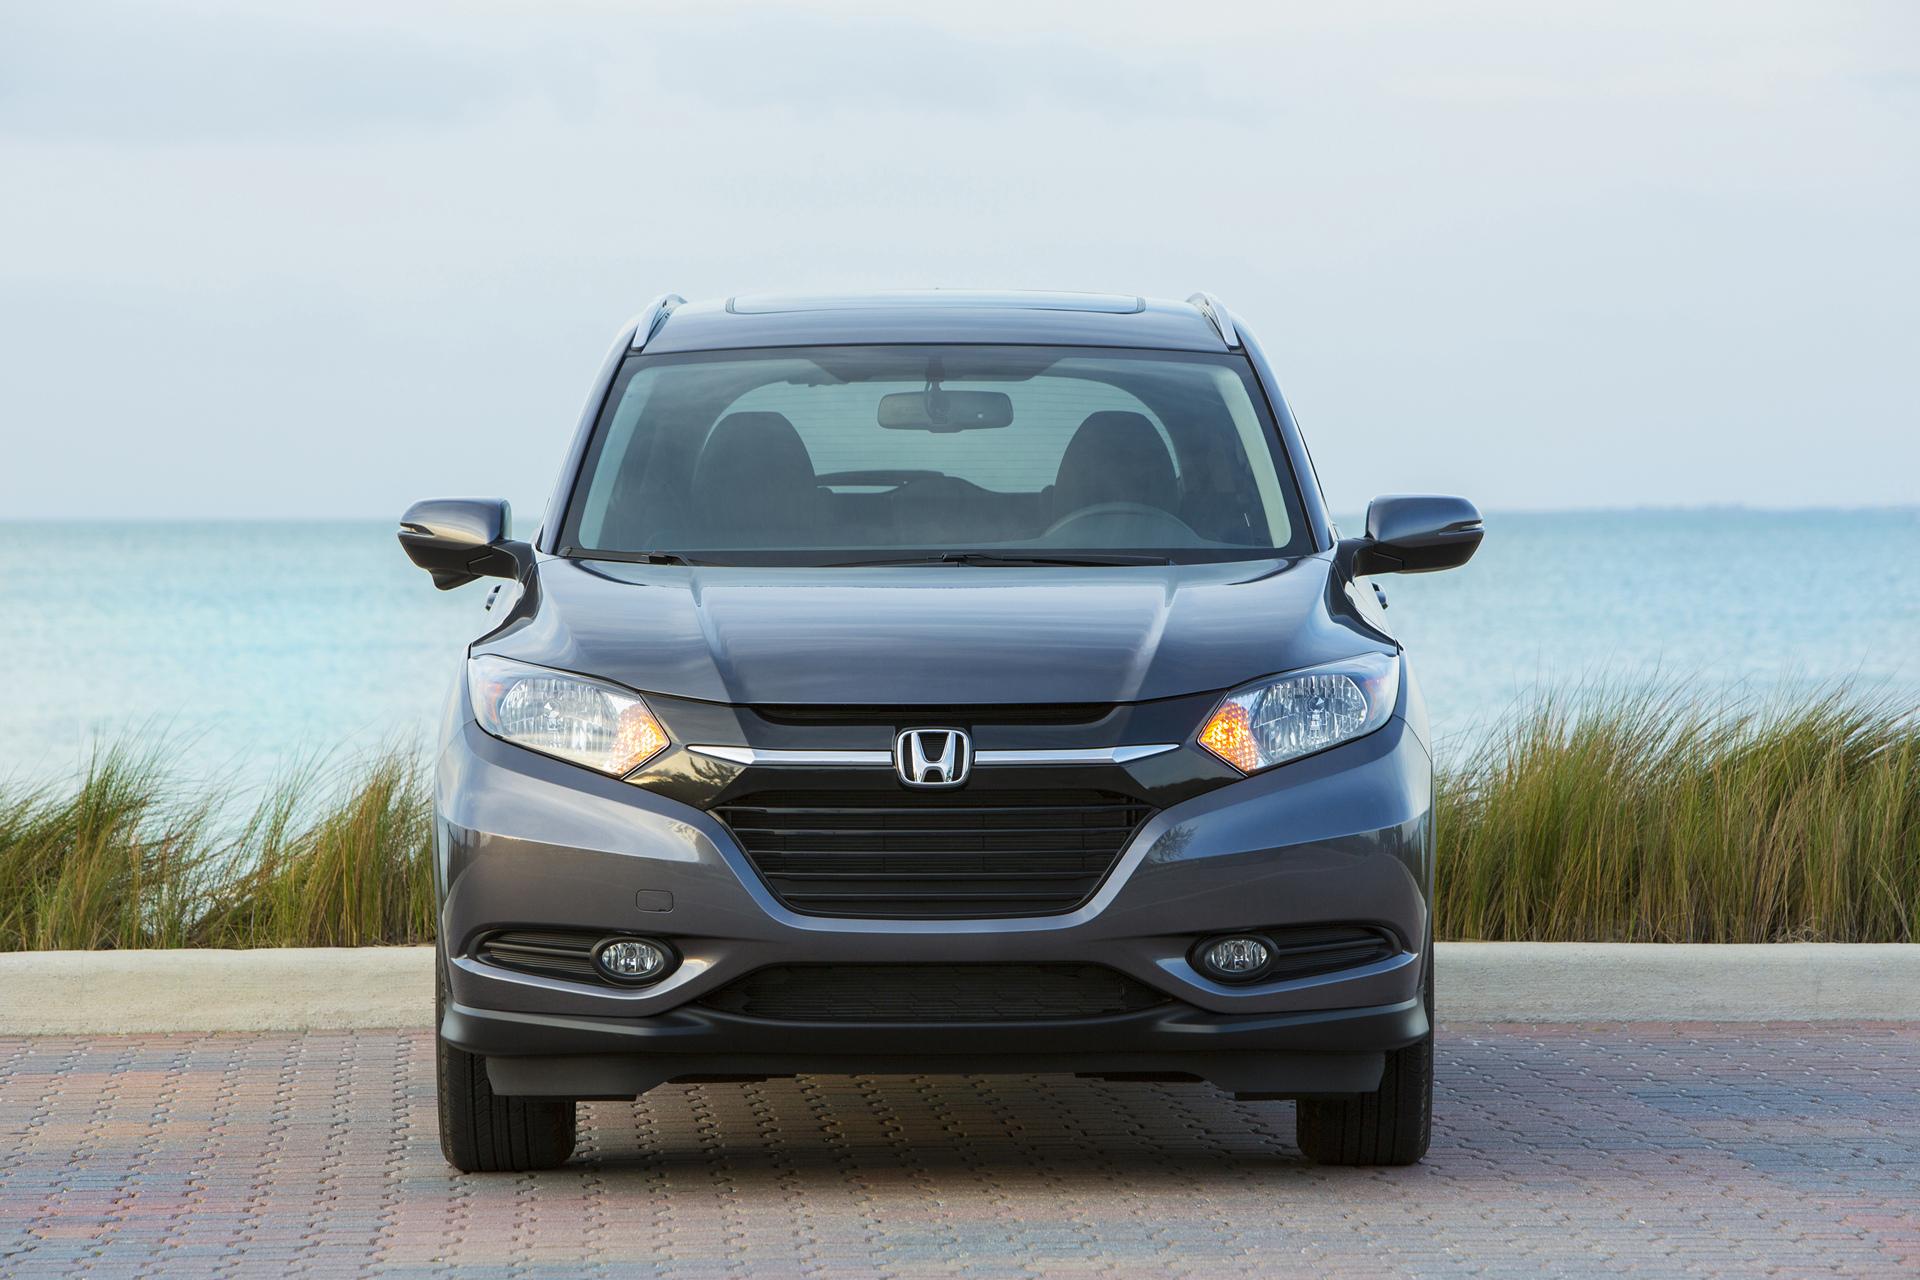 2017 Honda HR-V © Honda Motor Co., Ltd.